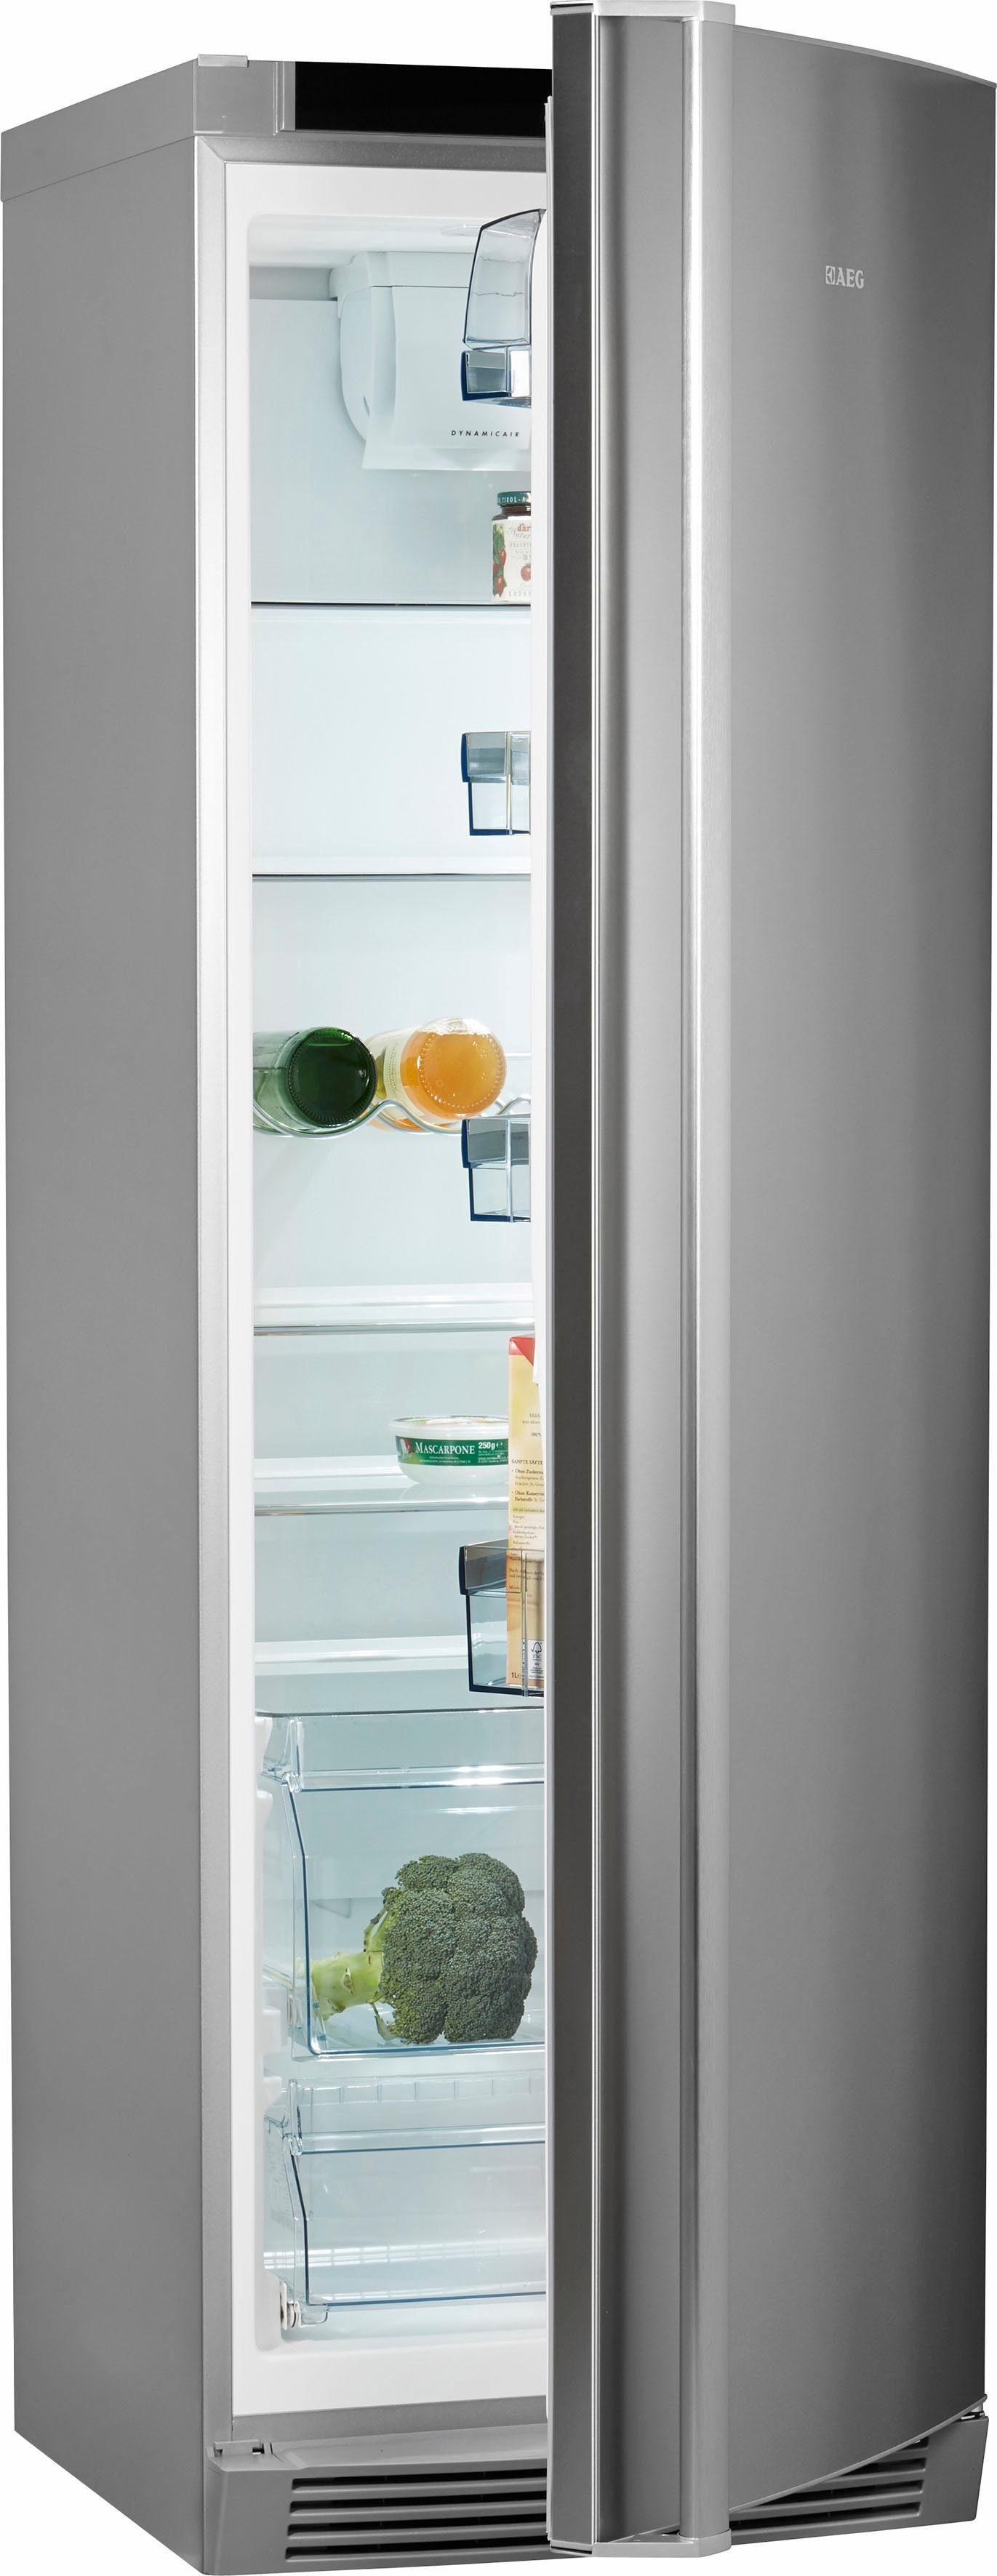 AEG Kühlschrank SANTO S73130KDX3, A+++, 180 cm hoch